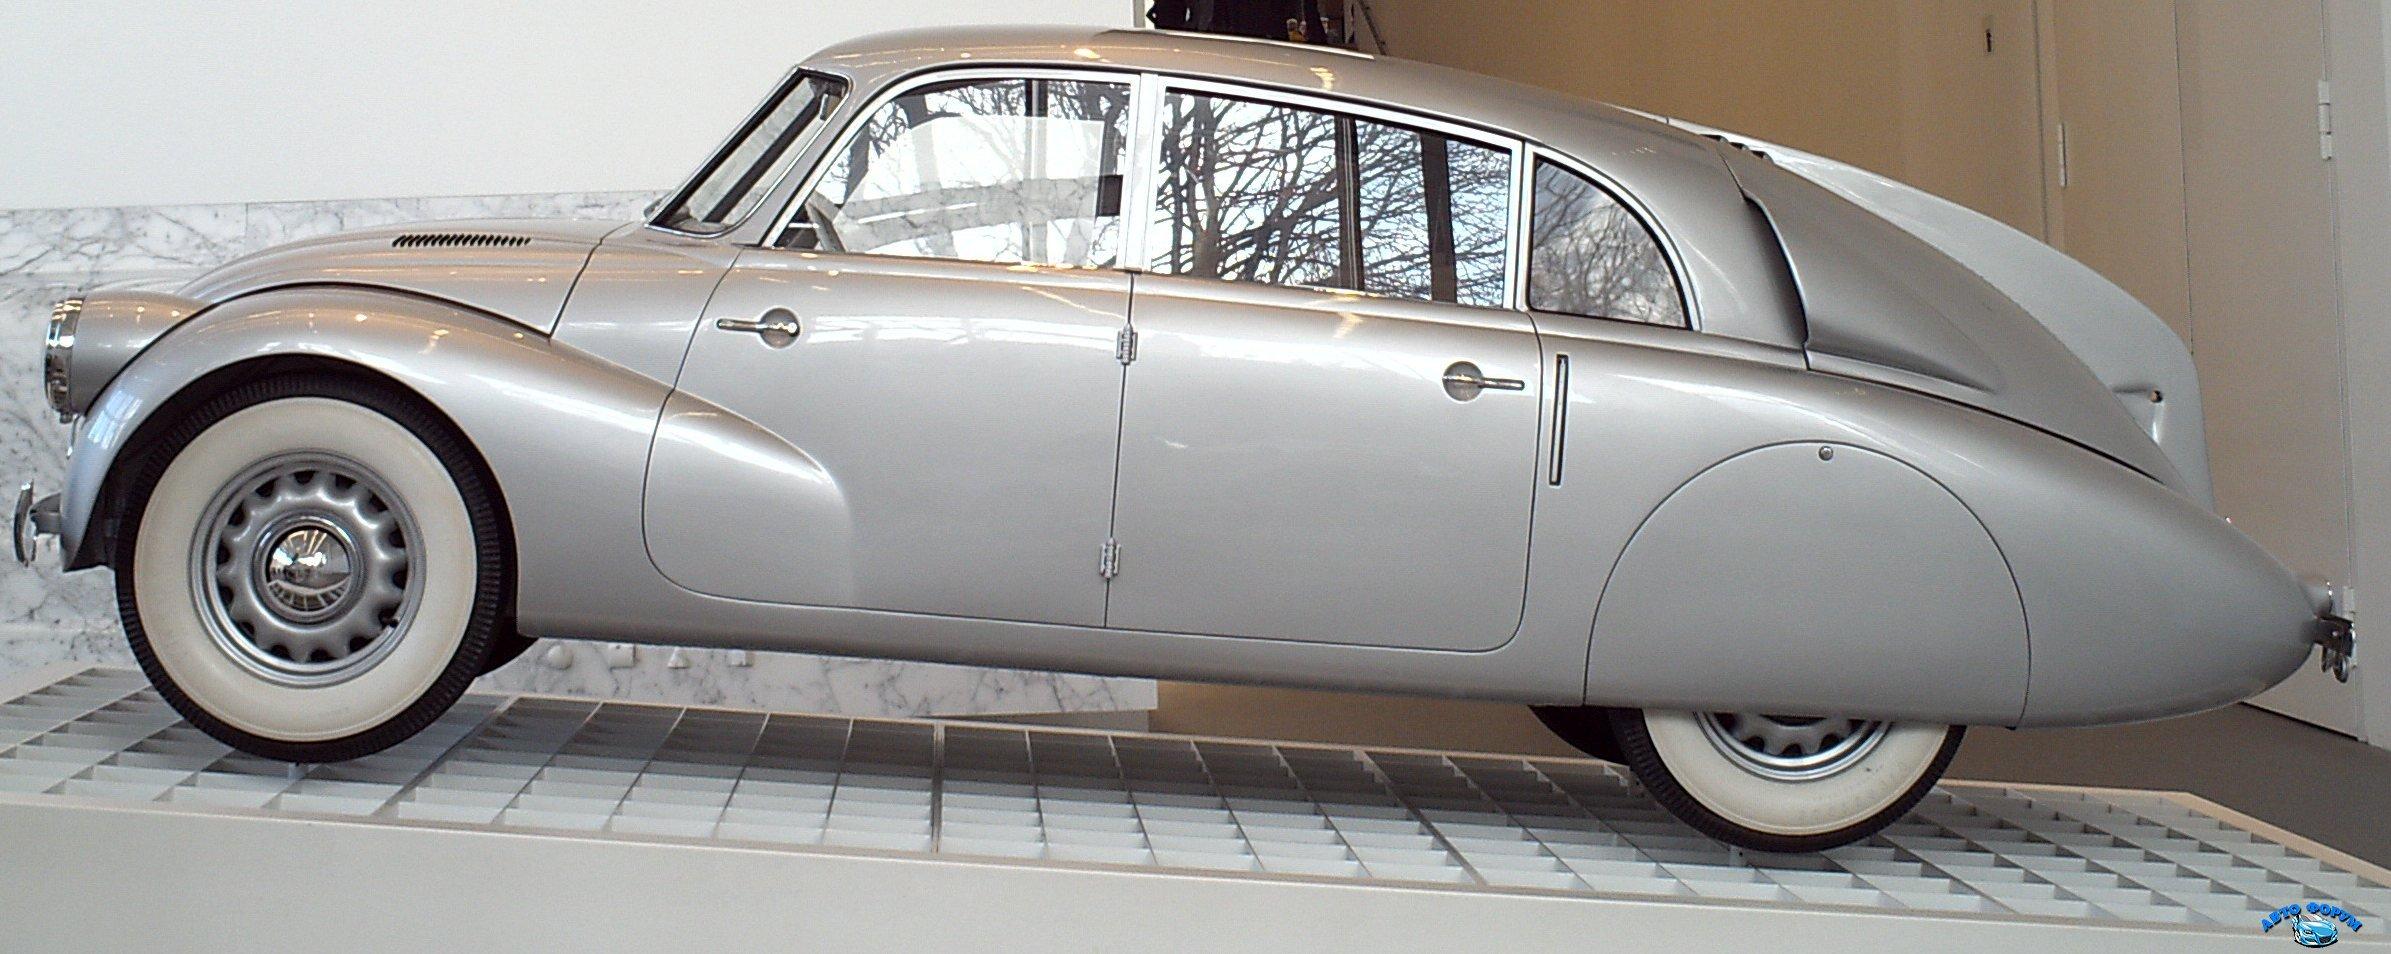 Tatra_87-old.jpg